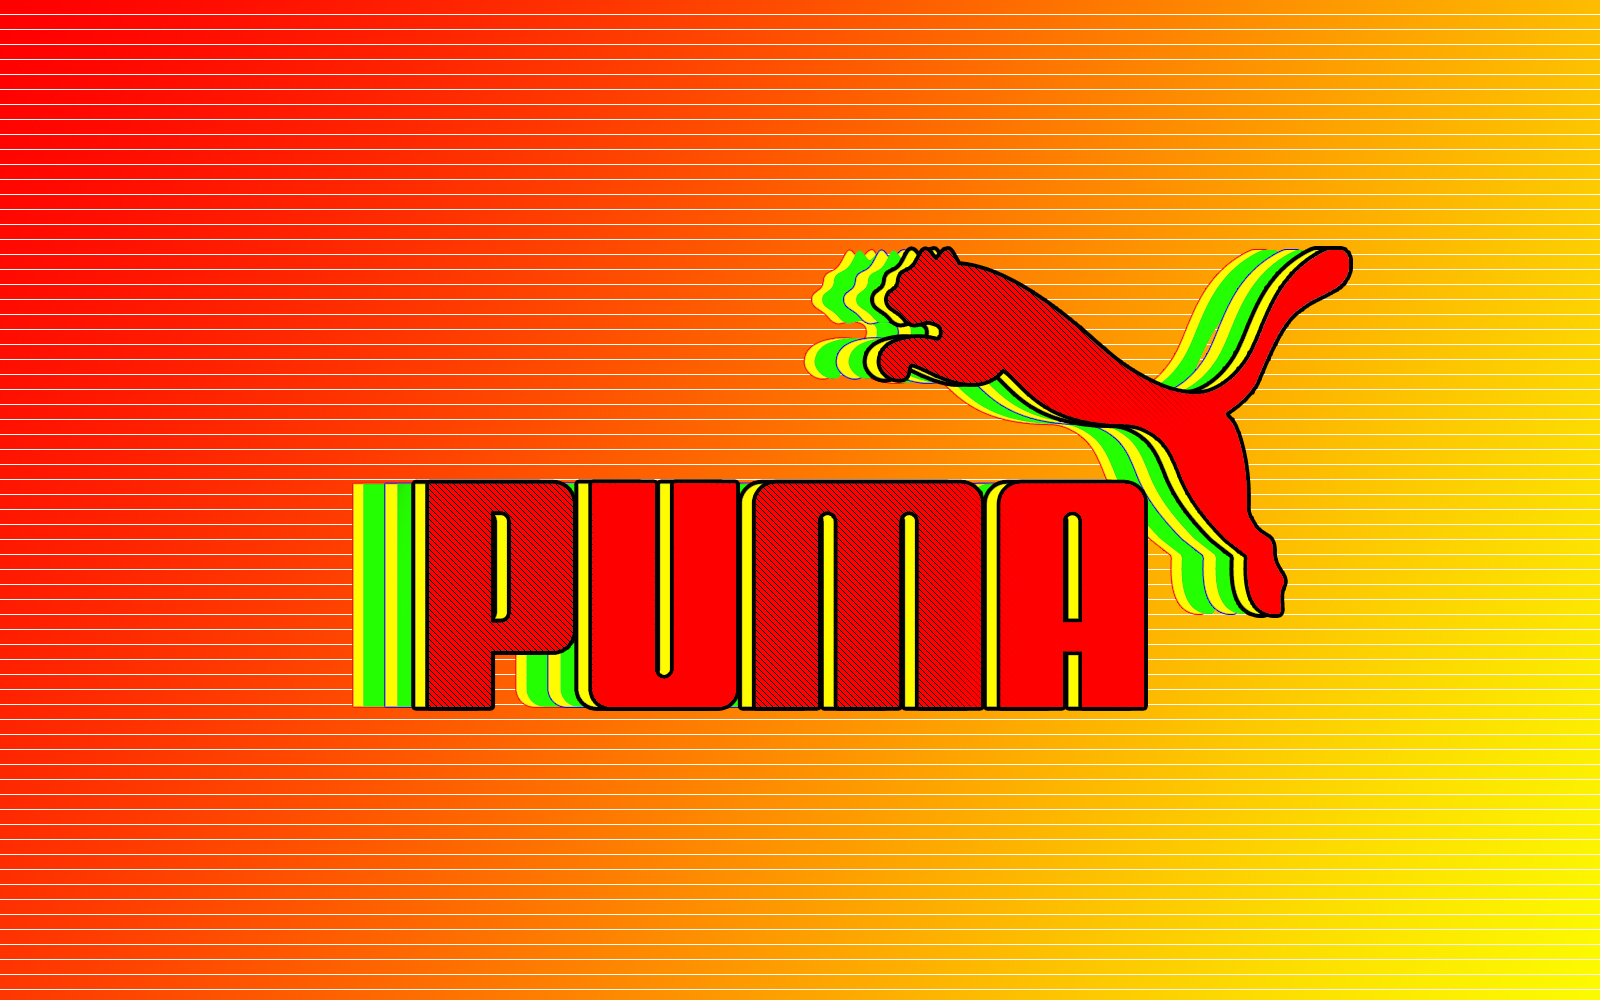 Go Back Images For Pumas Logo Wallpaper 1600x1000